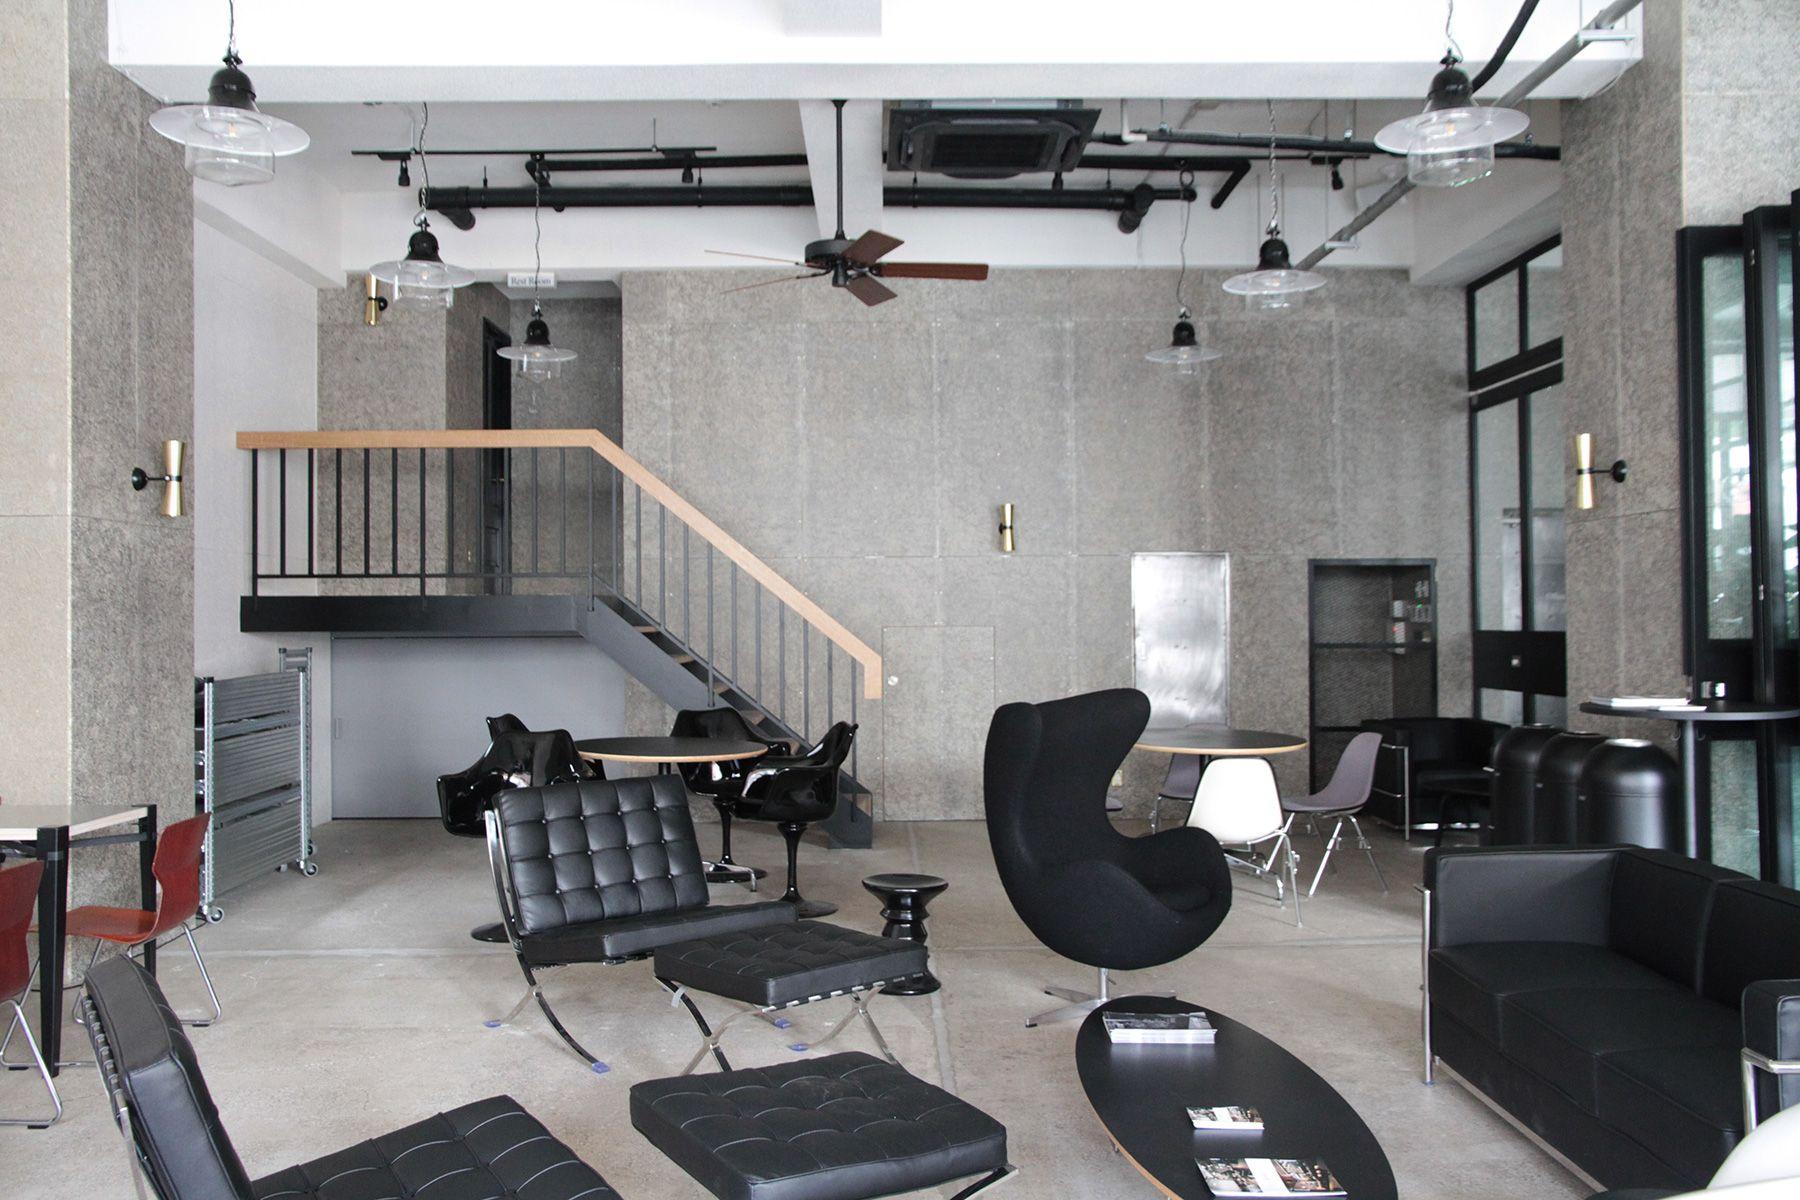 ROJU NAKAMEGURO ロジュ ナカメグロミッドセンチュリーの家具